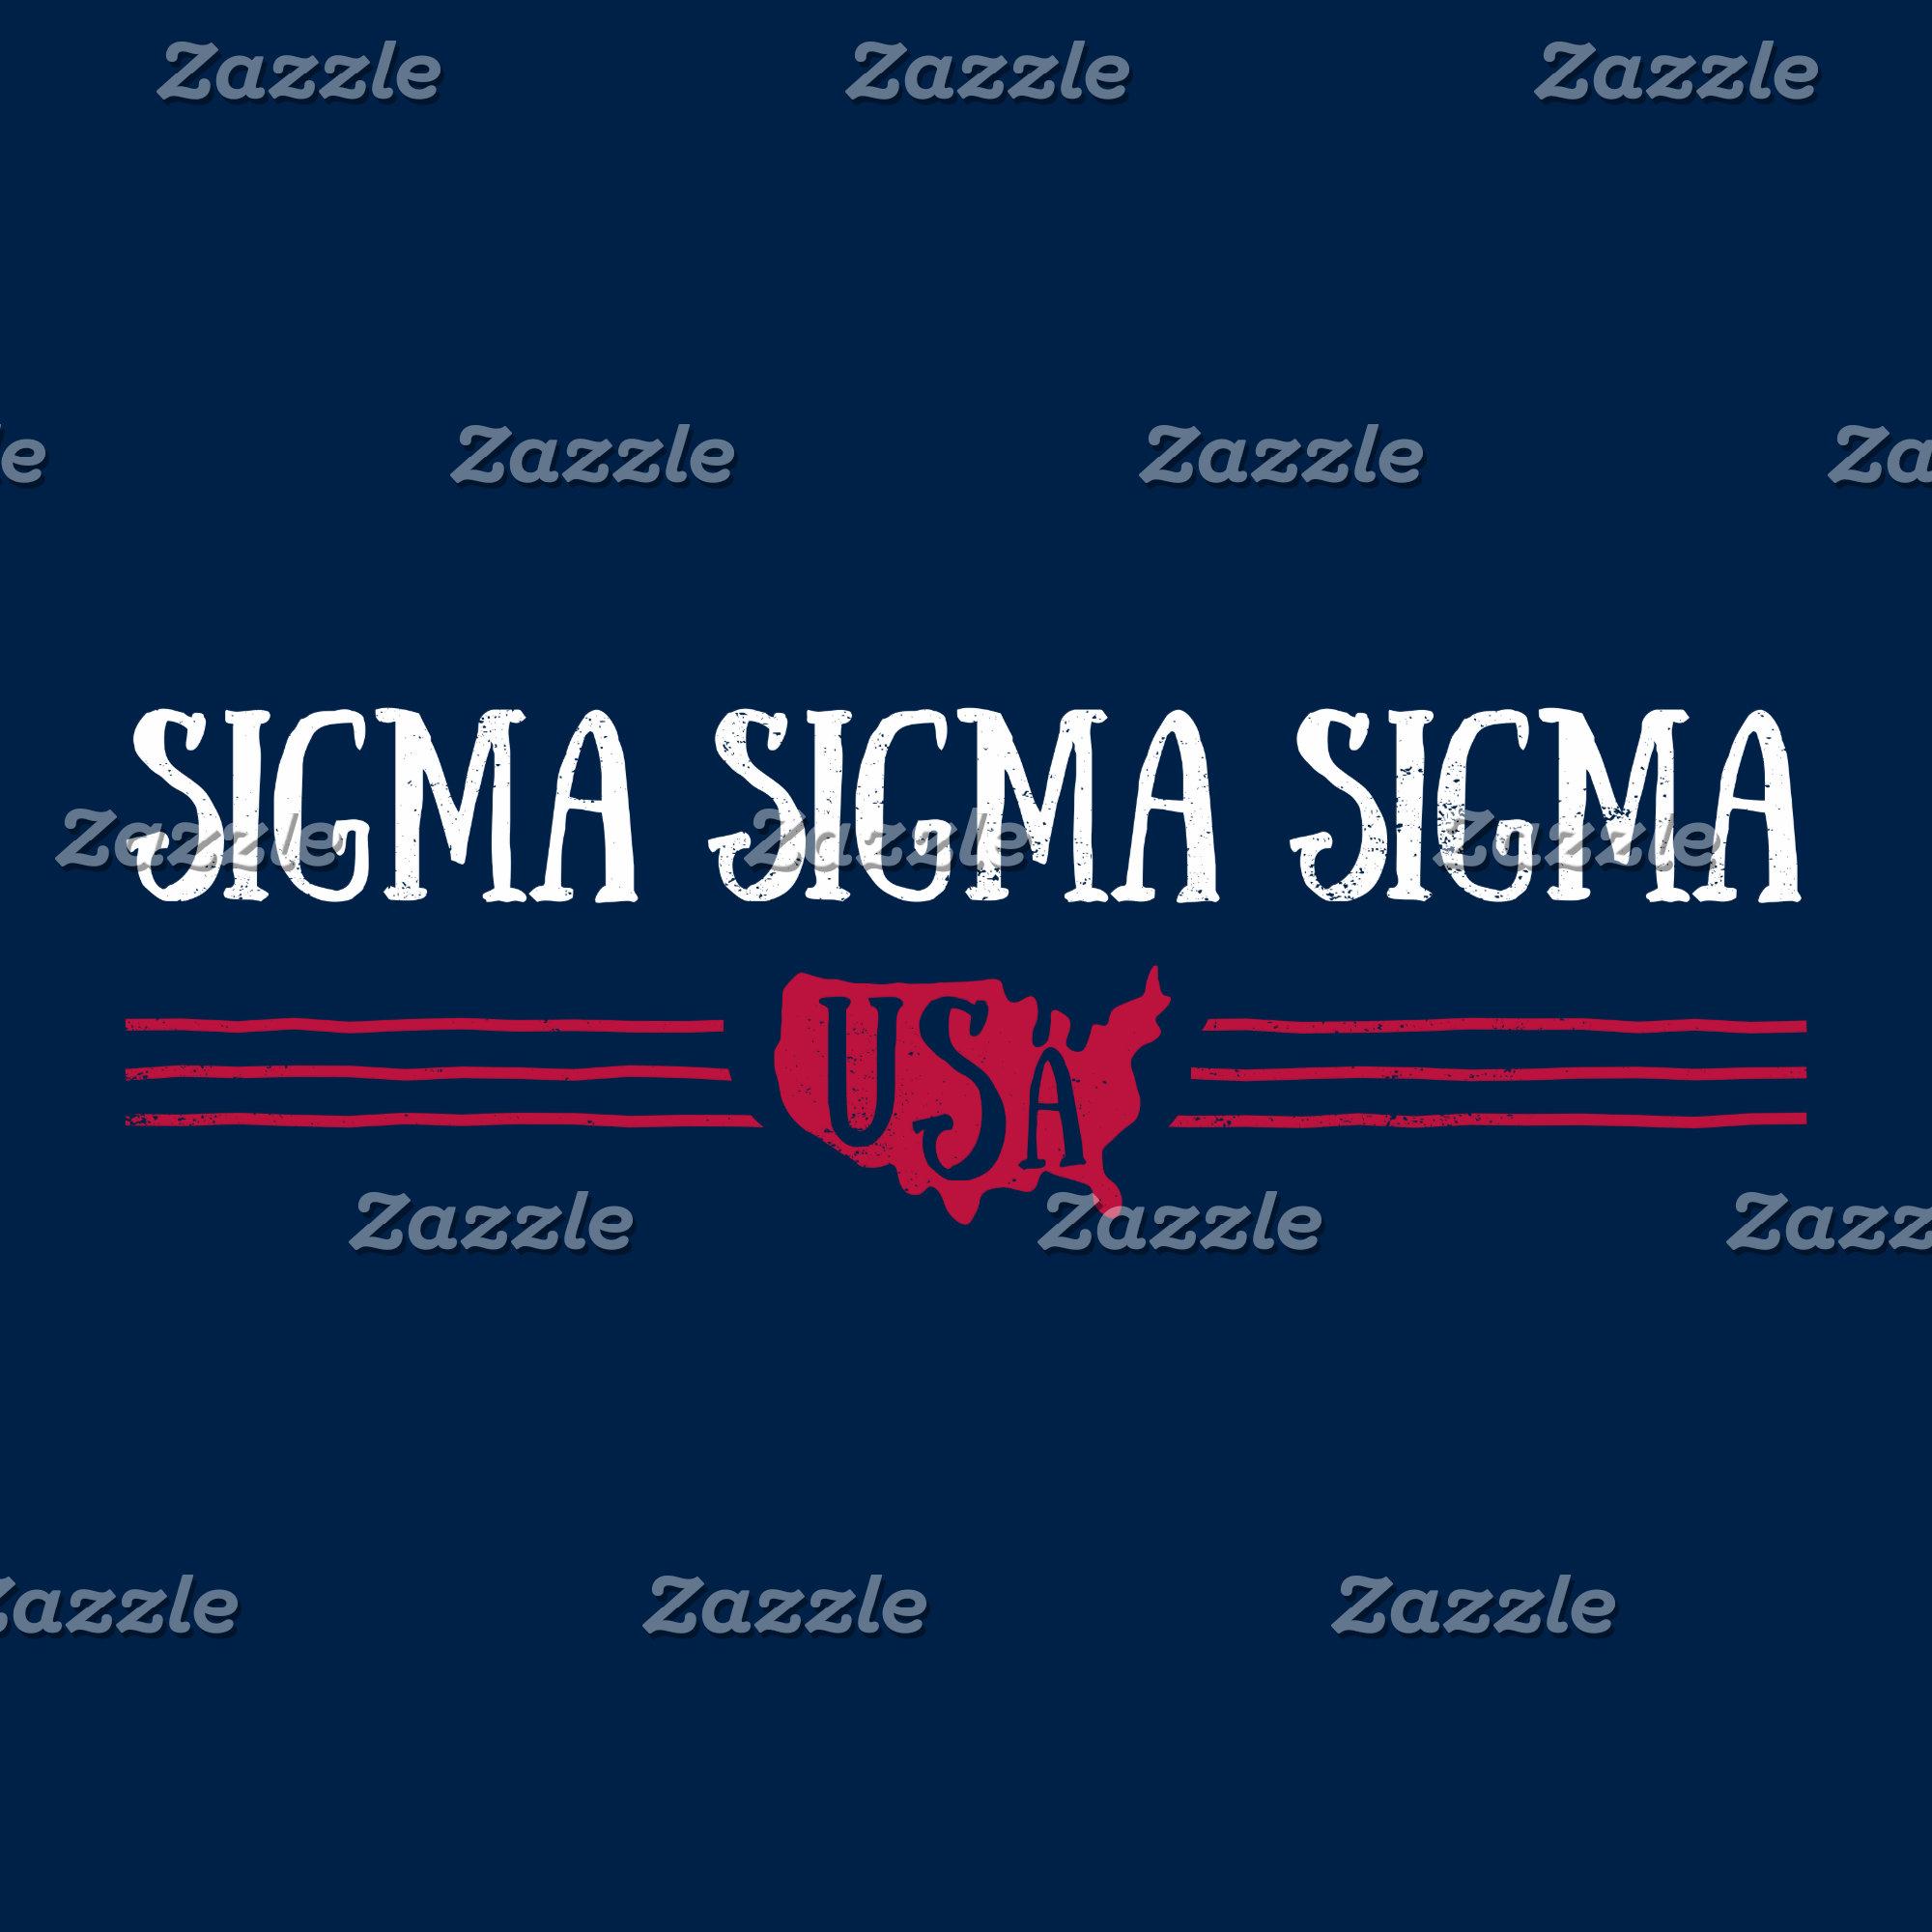 Sigma Sigma Sigma - USA